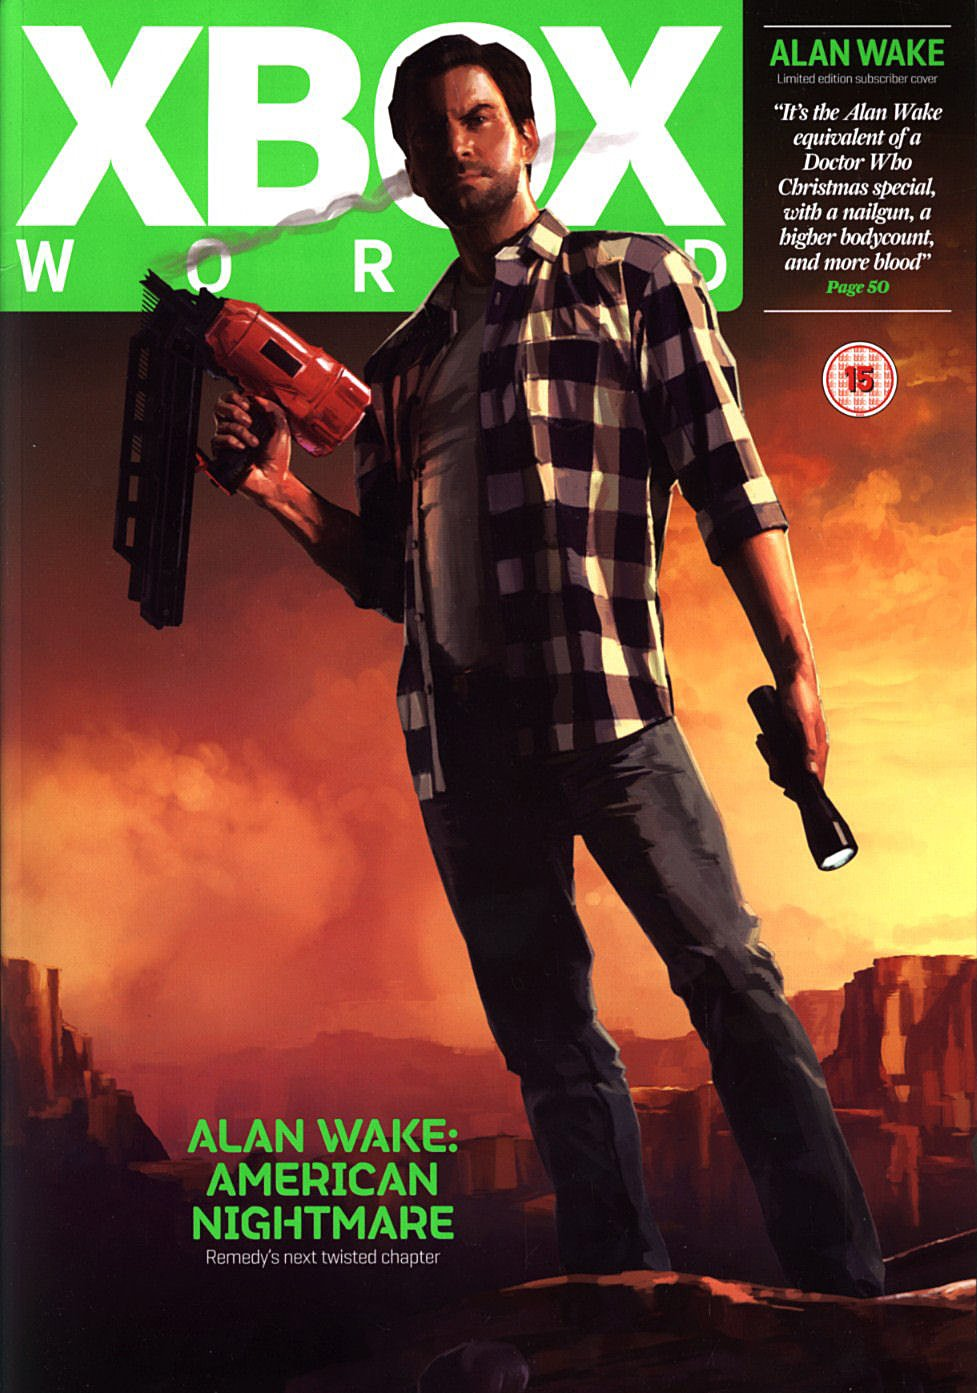 XBox World Issue 113 (February 2012)